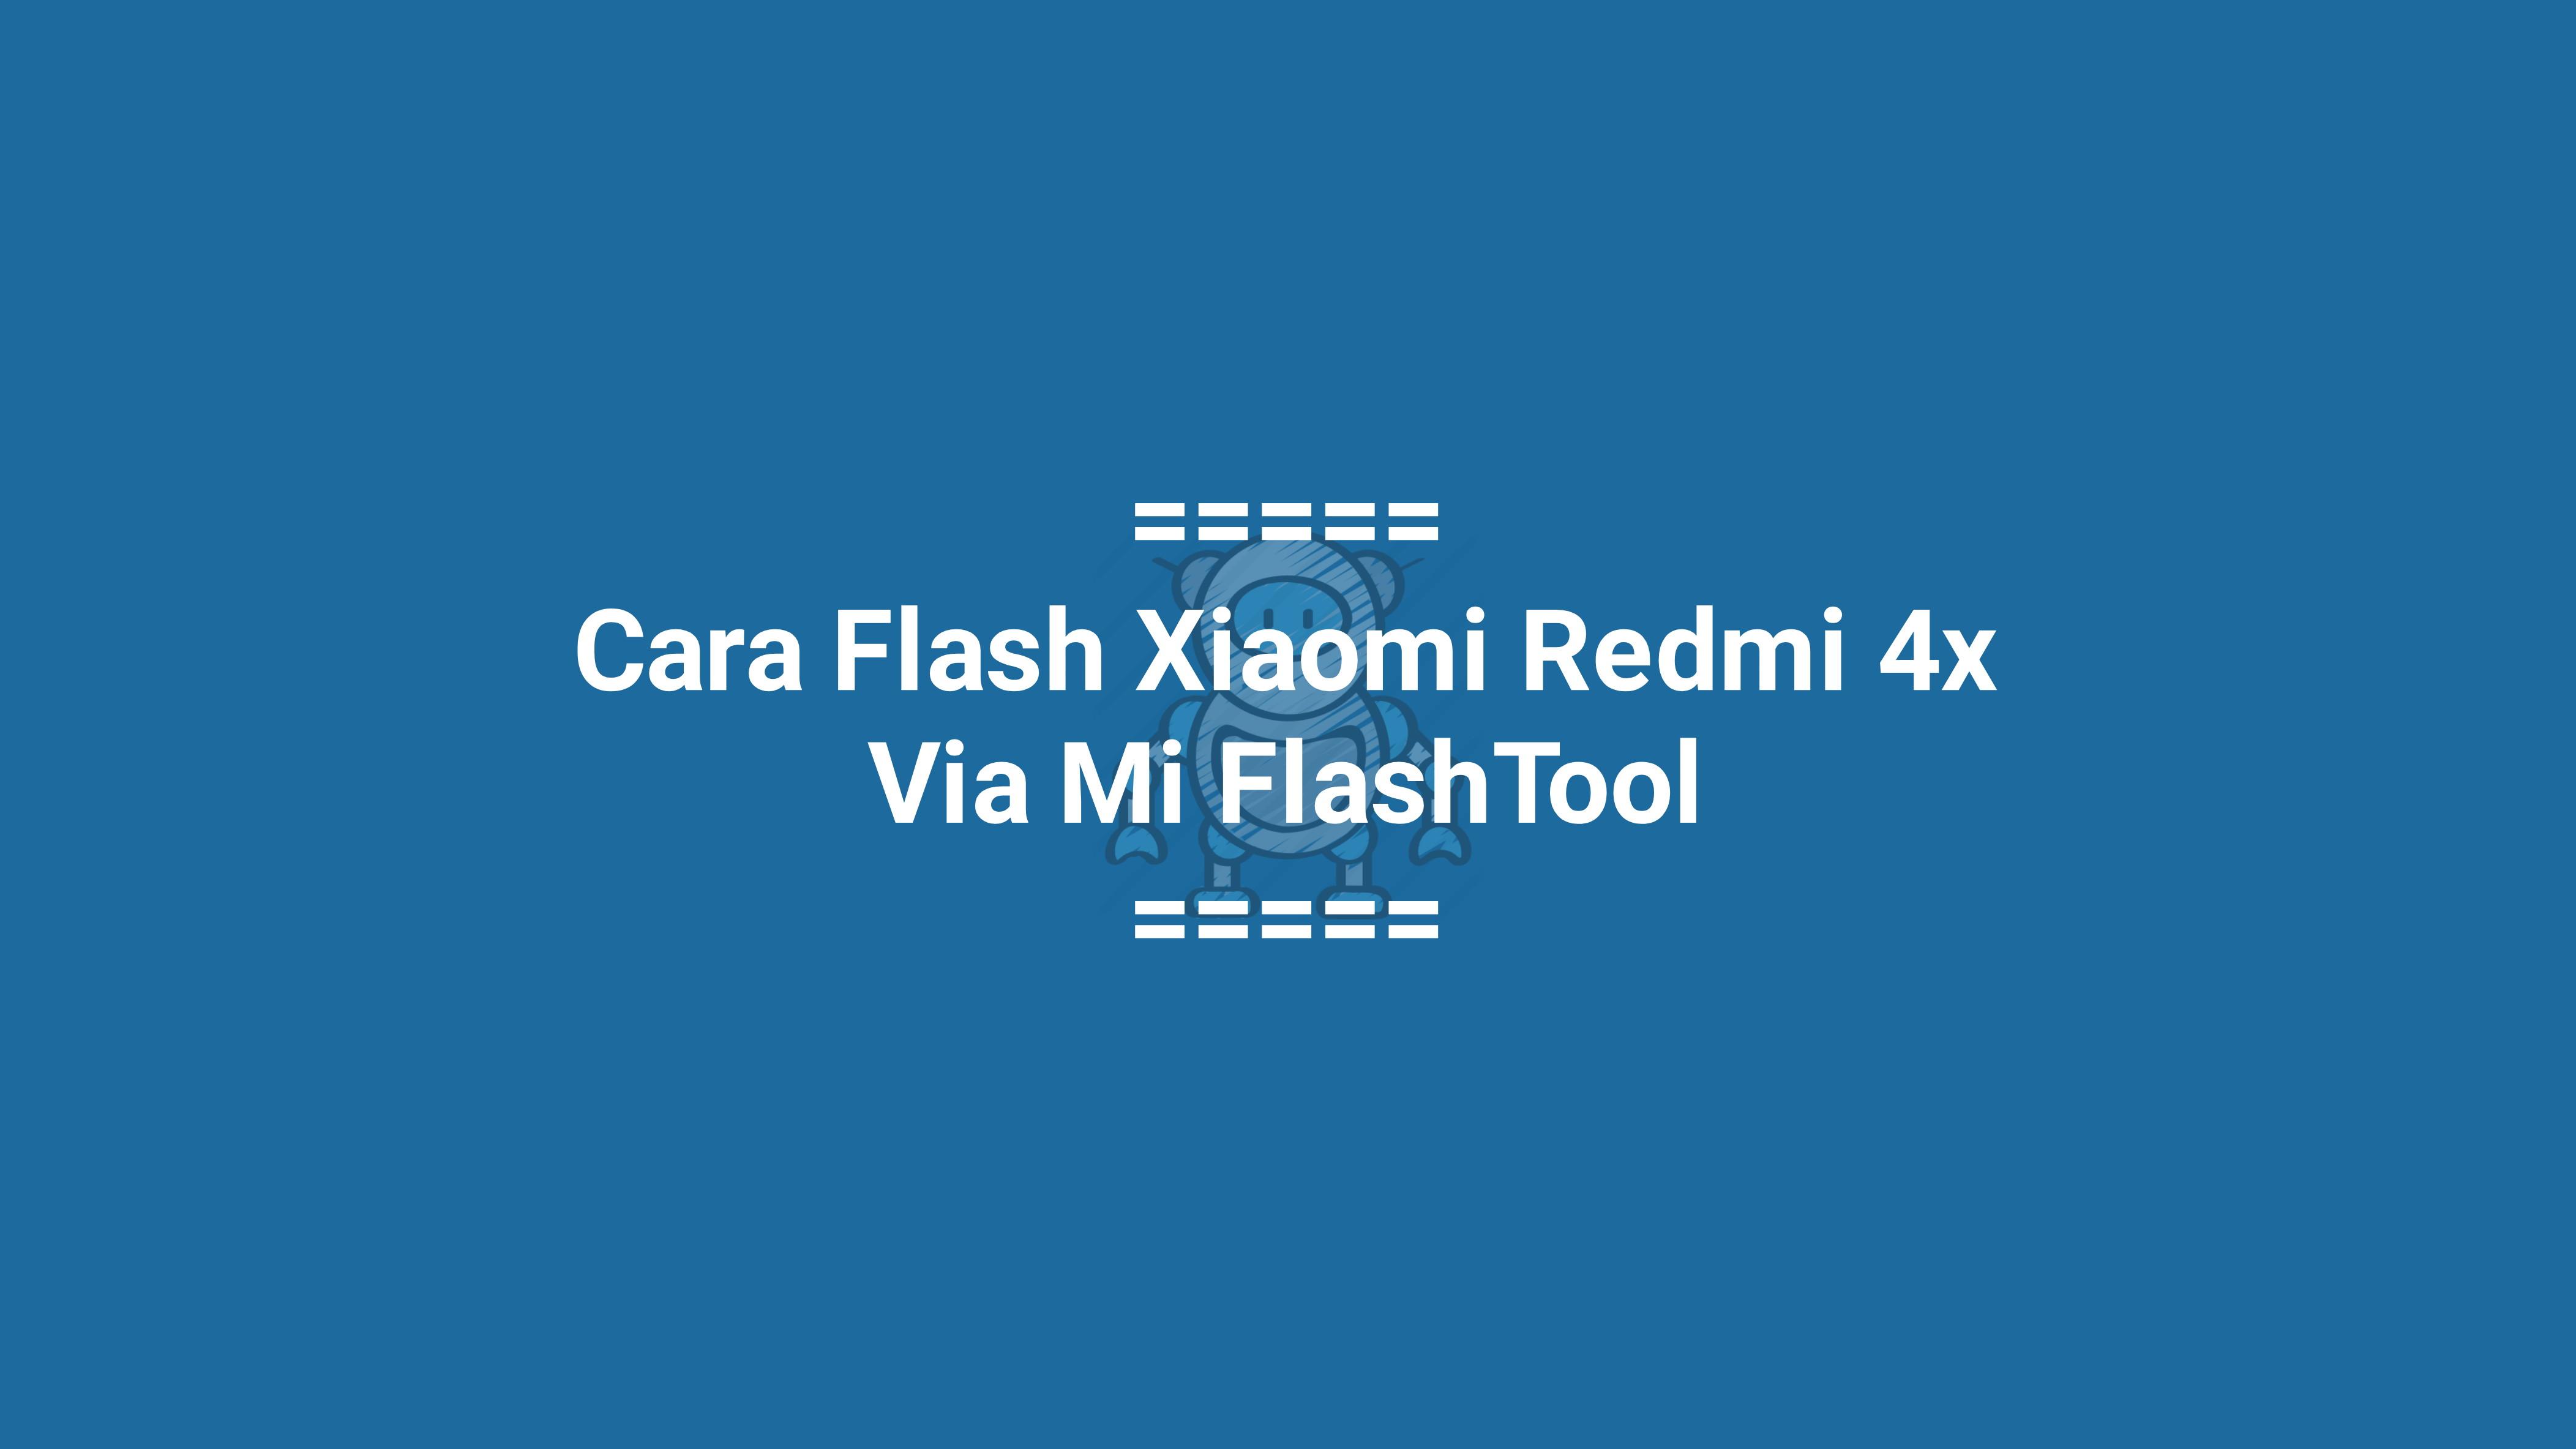 Cara Flash Xiaomi Redmi 4X